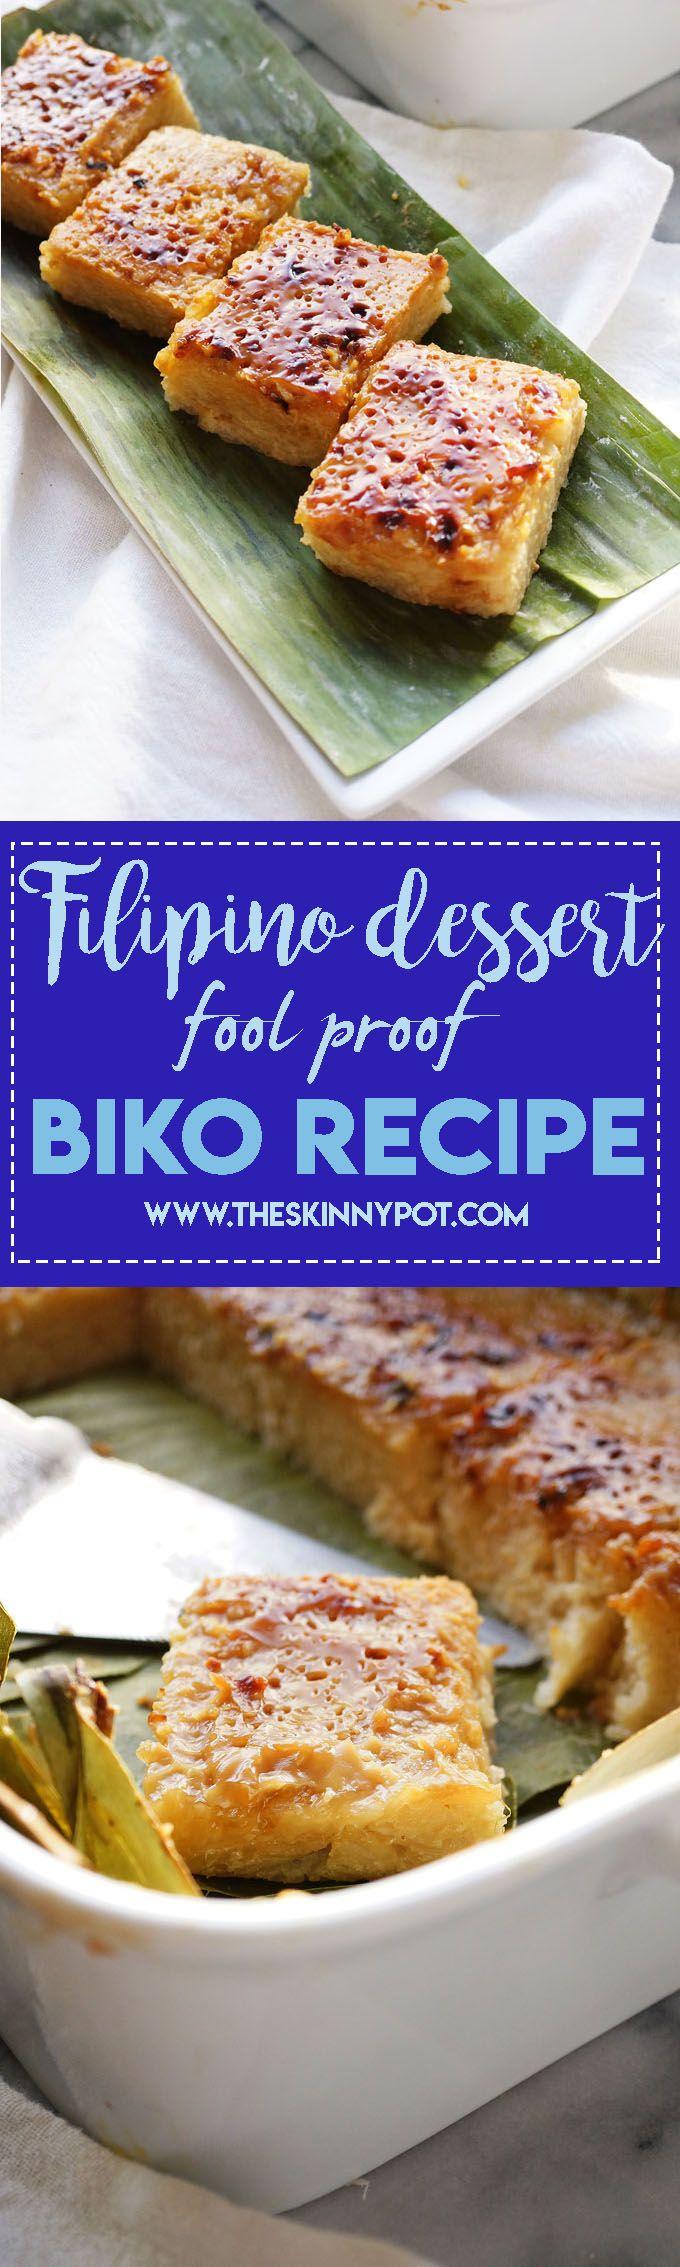 How Do You Make Biko with Latik Topping